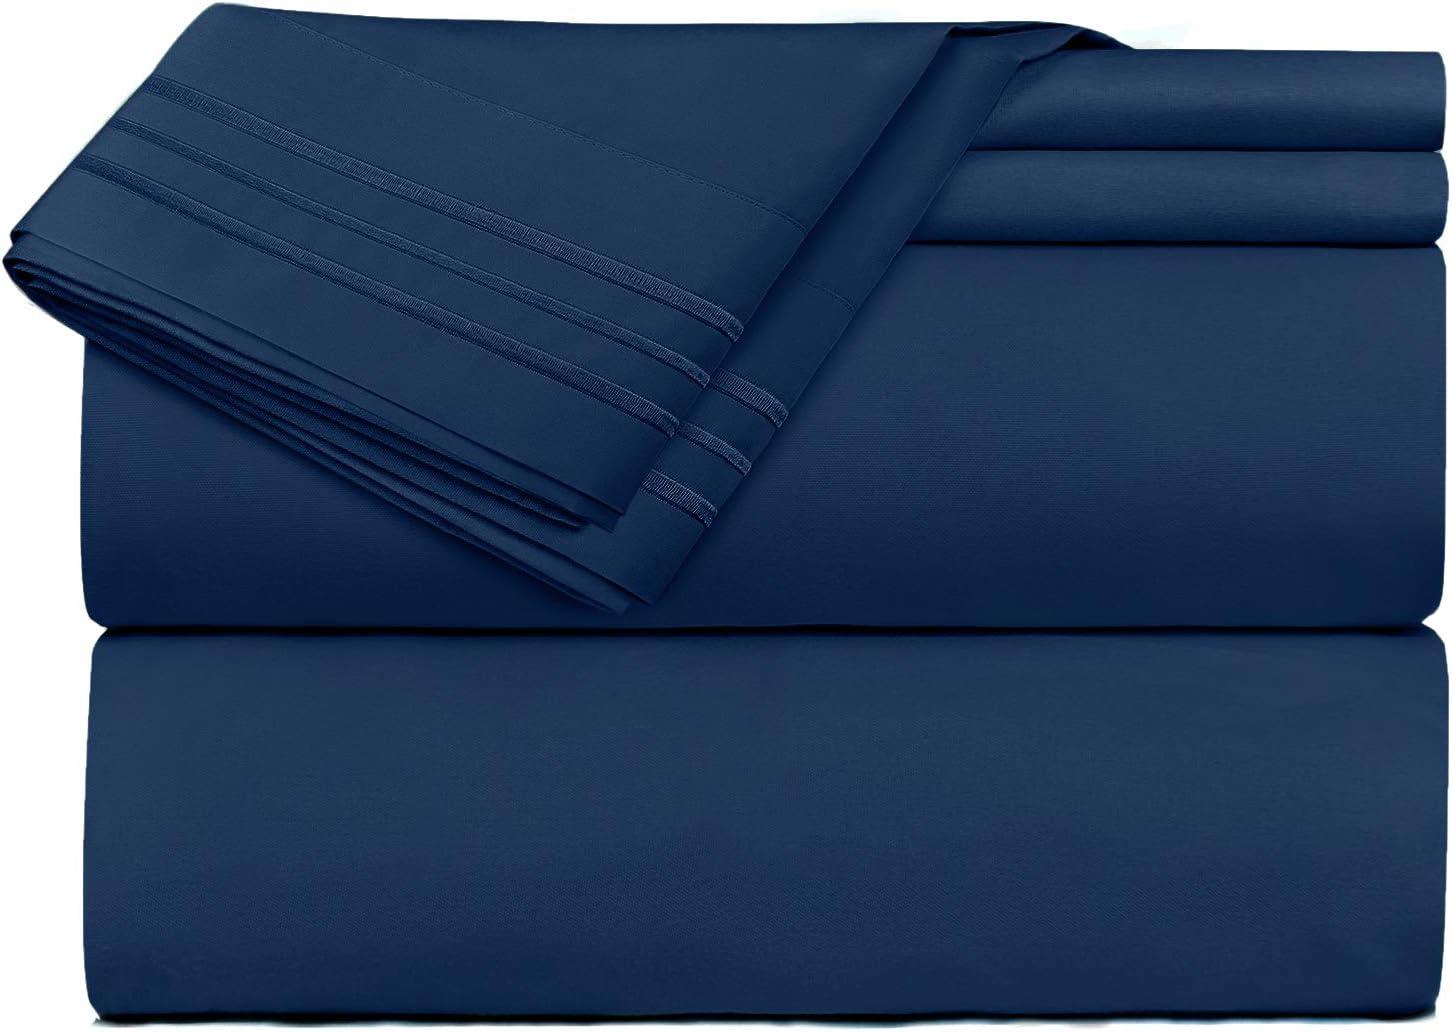 Clara Clark 1800 Premier Series 4pc Blue Bed Sheet Set